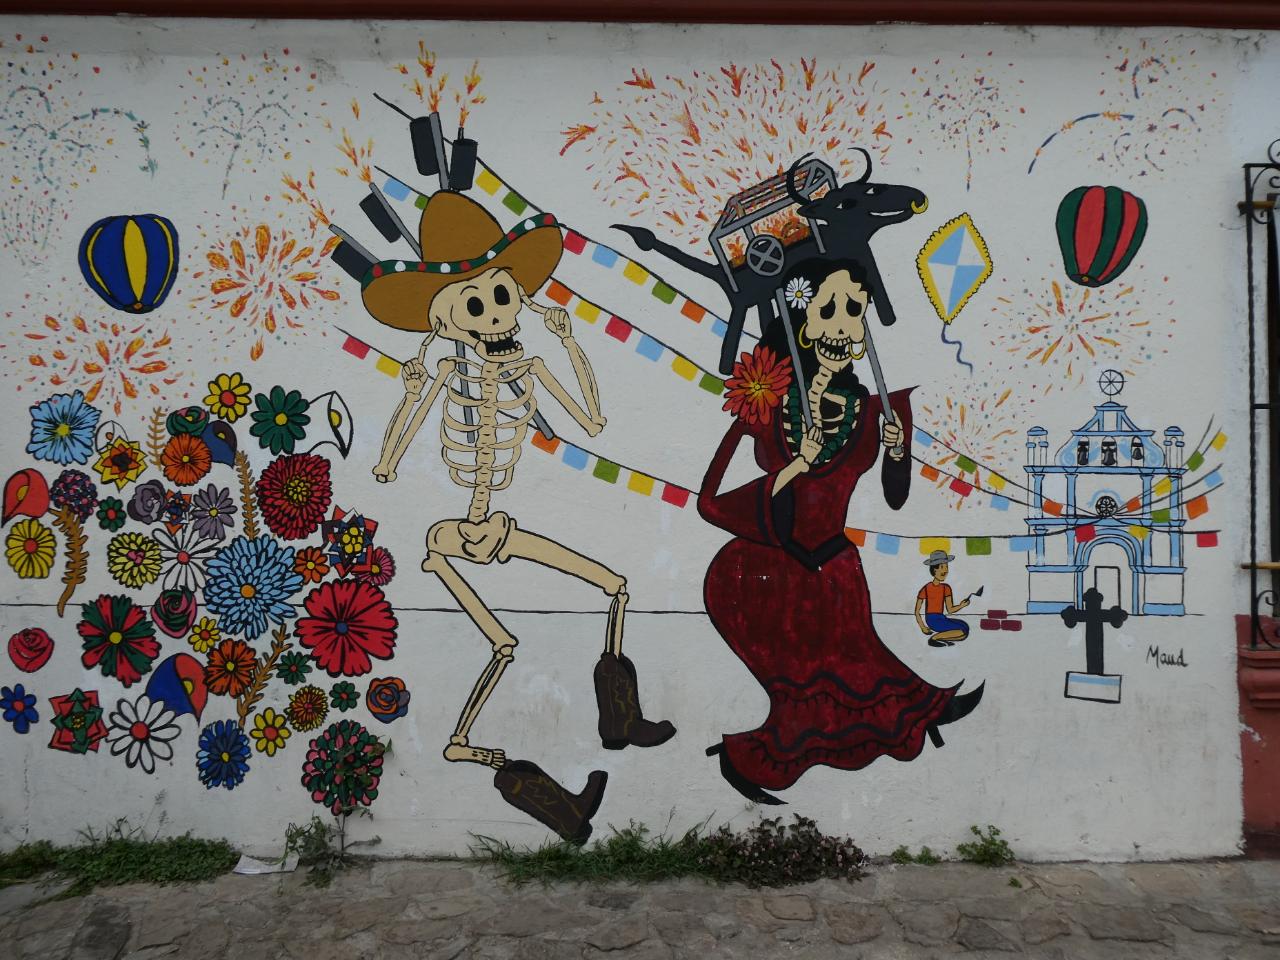 Photo 2: San Cristobal de las Casas, Chiapas, Mexique